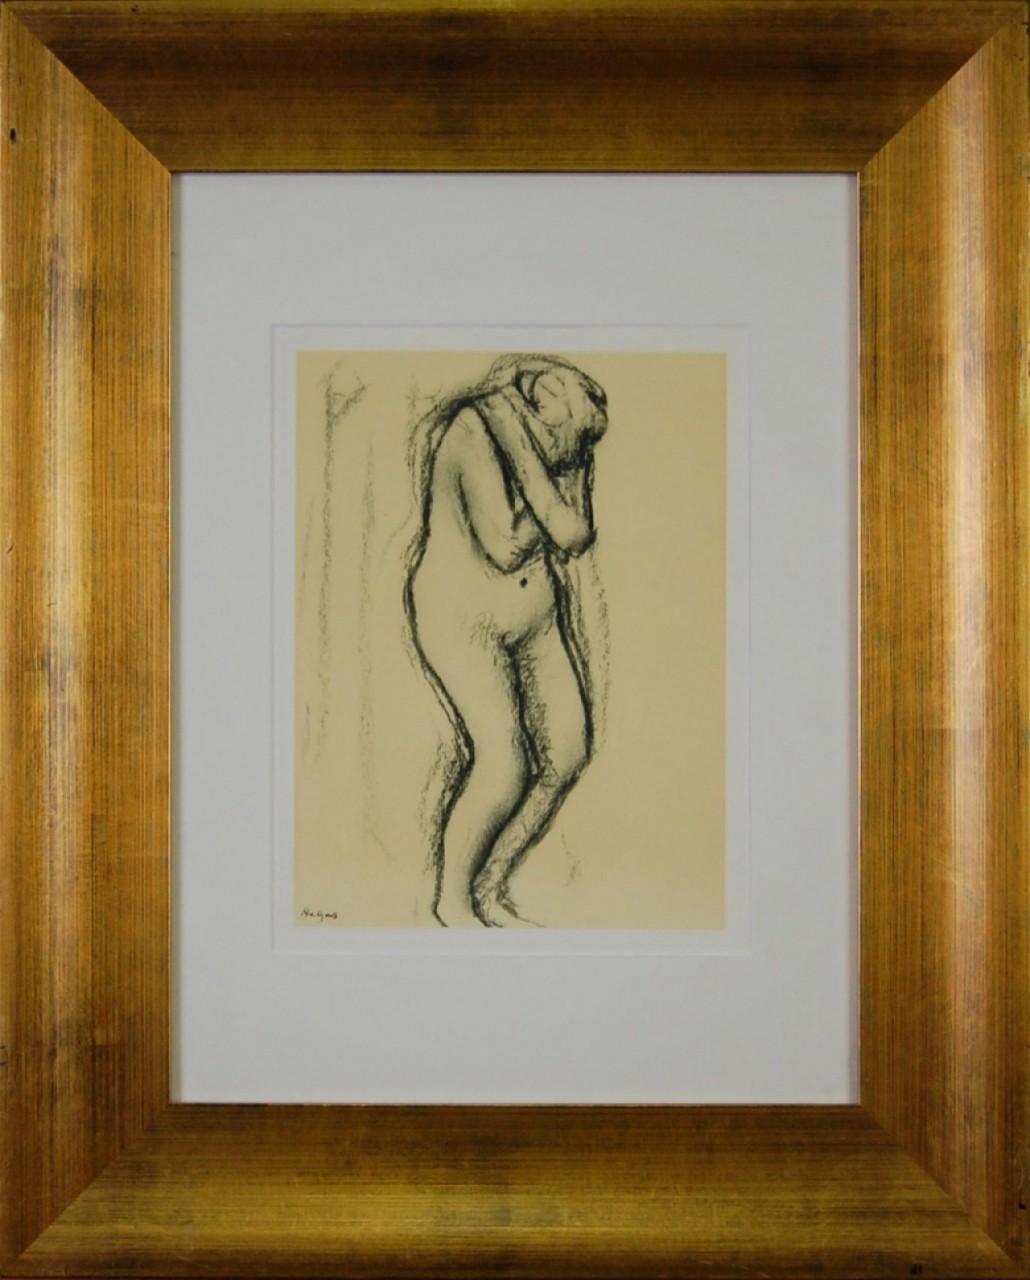 DEGAS Edgar femme nue recroquevillée